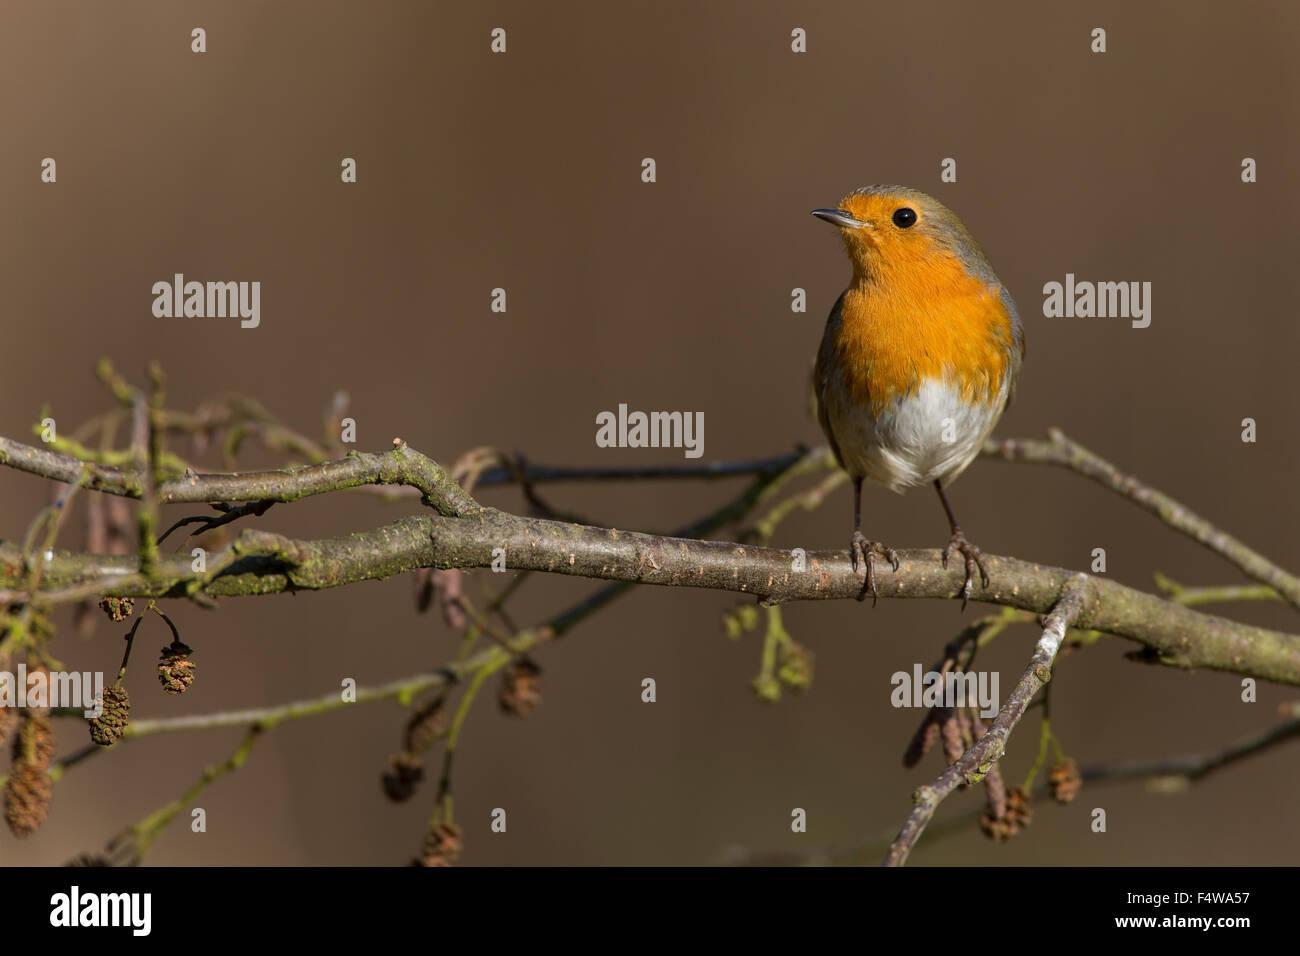 Robin, European robin, Rotkehlchen, Erithacus rubecula, Le Rouge-gorge familier - Stock Image